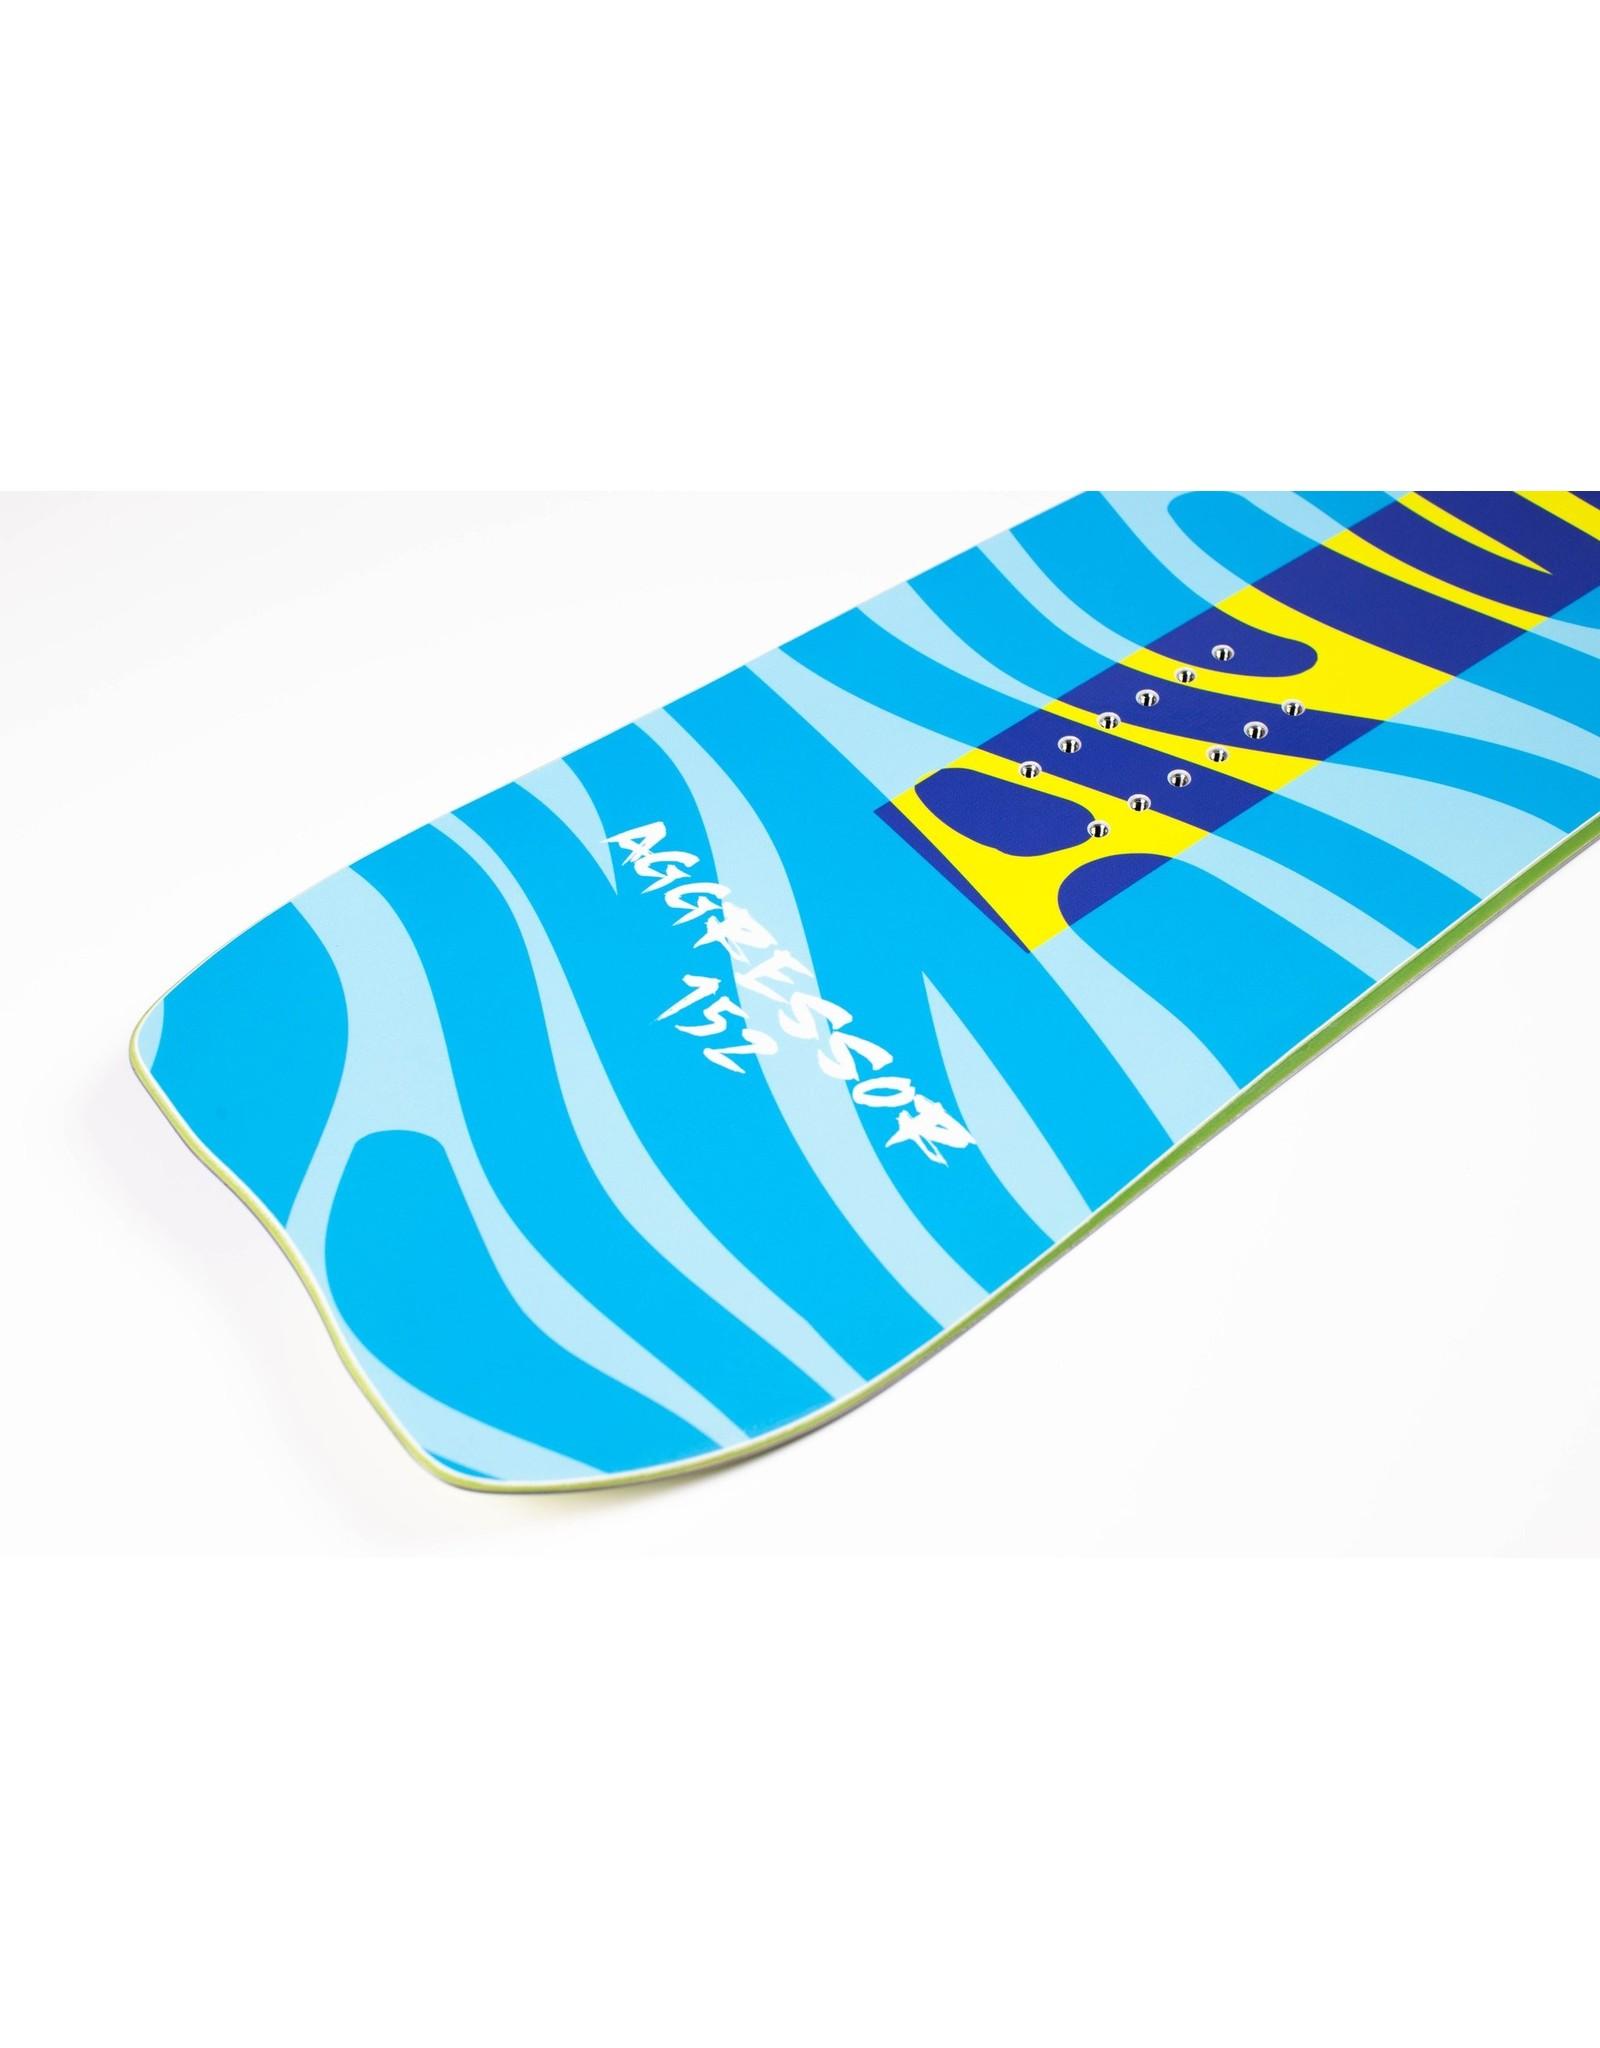 Kemper Snowboards Aggressor Snowboard 2021/22